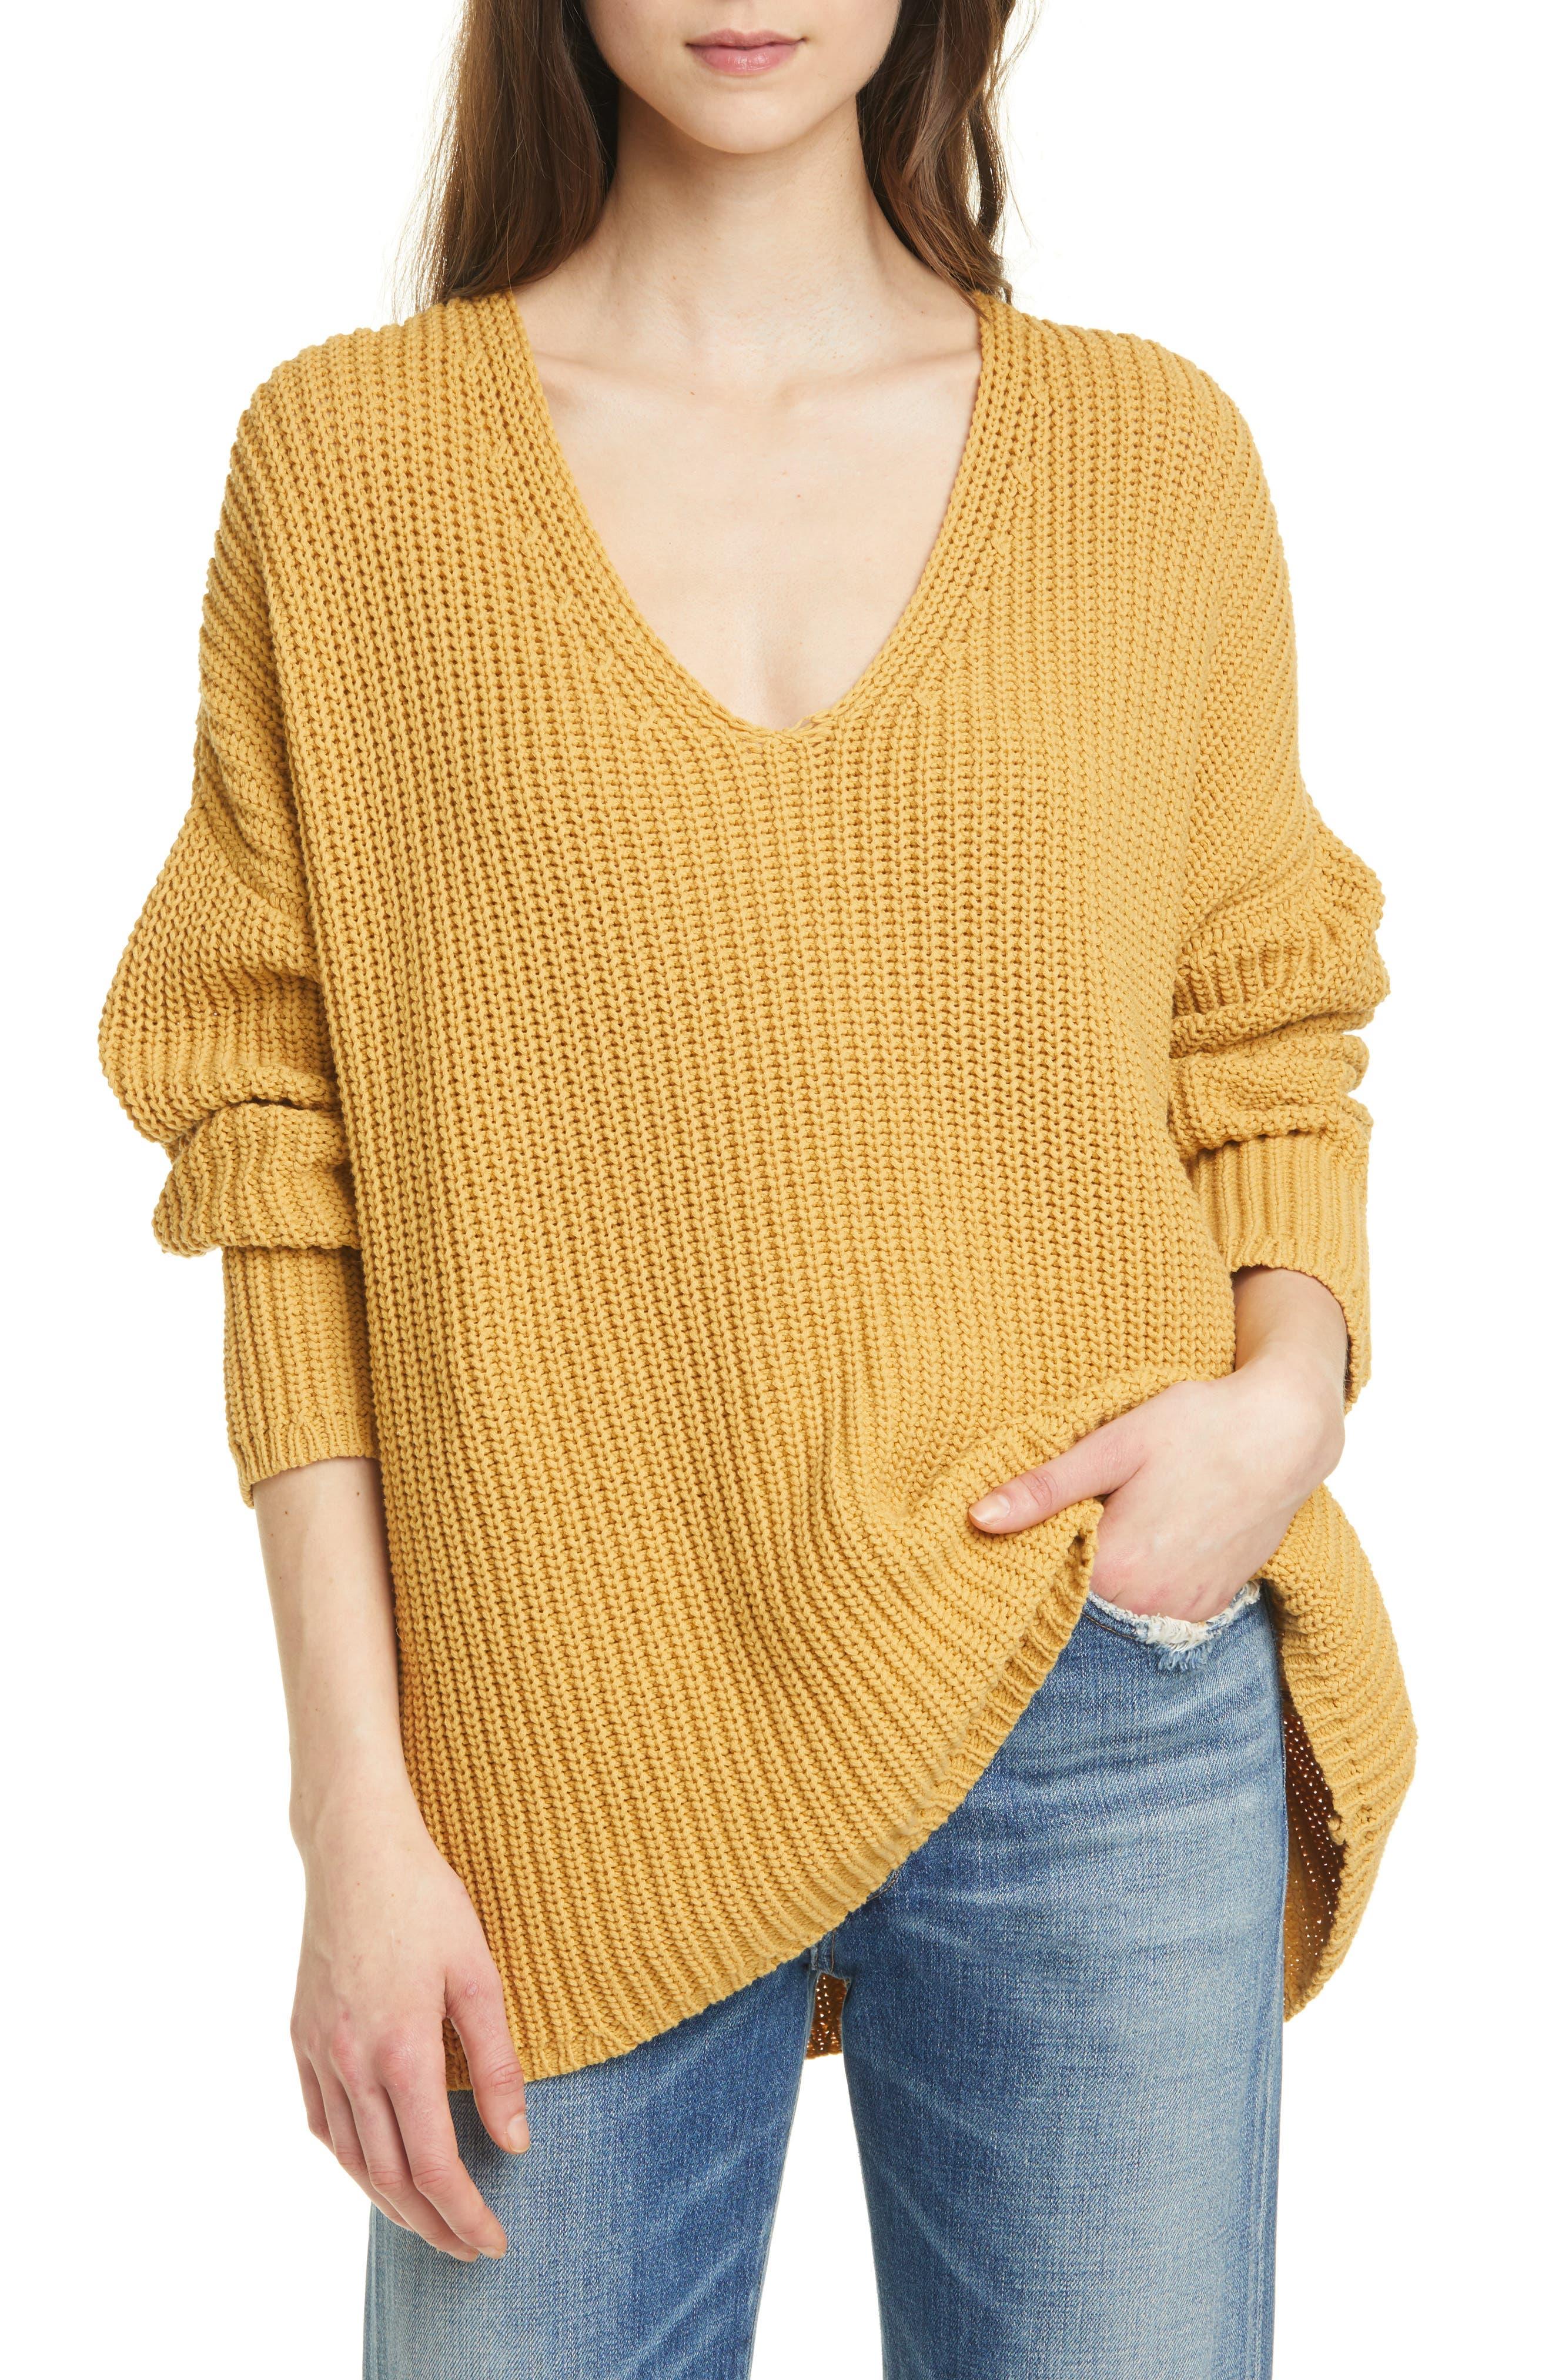 Fisherman Organic Cotton Blend Sweater